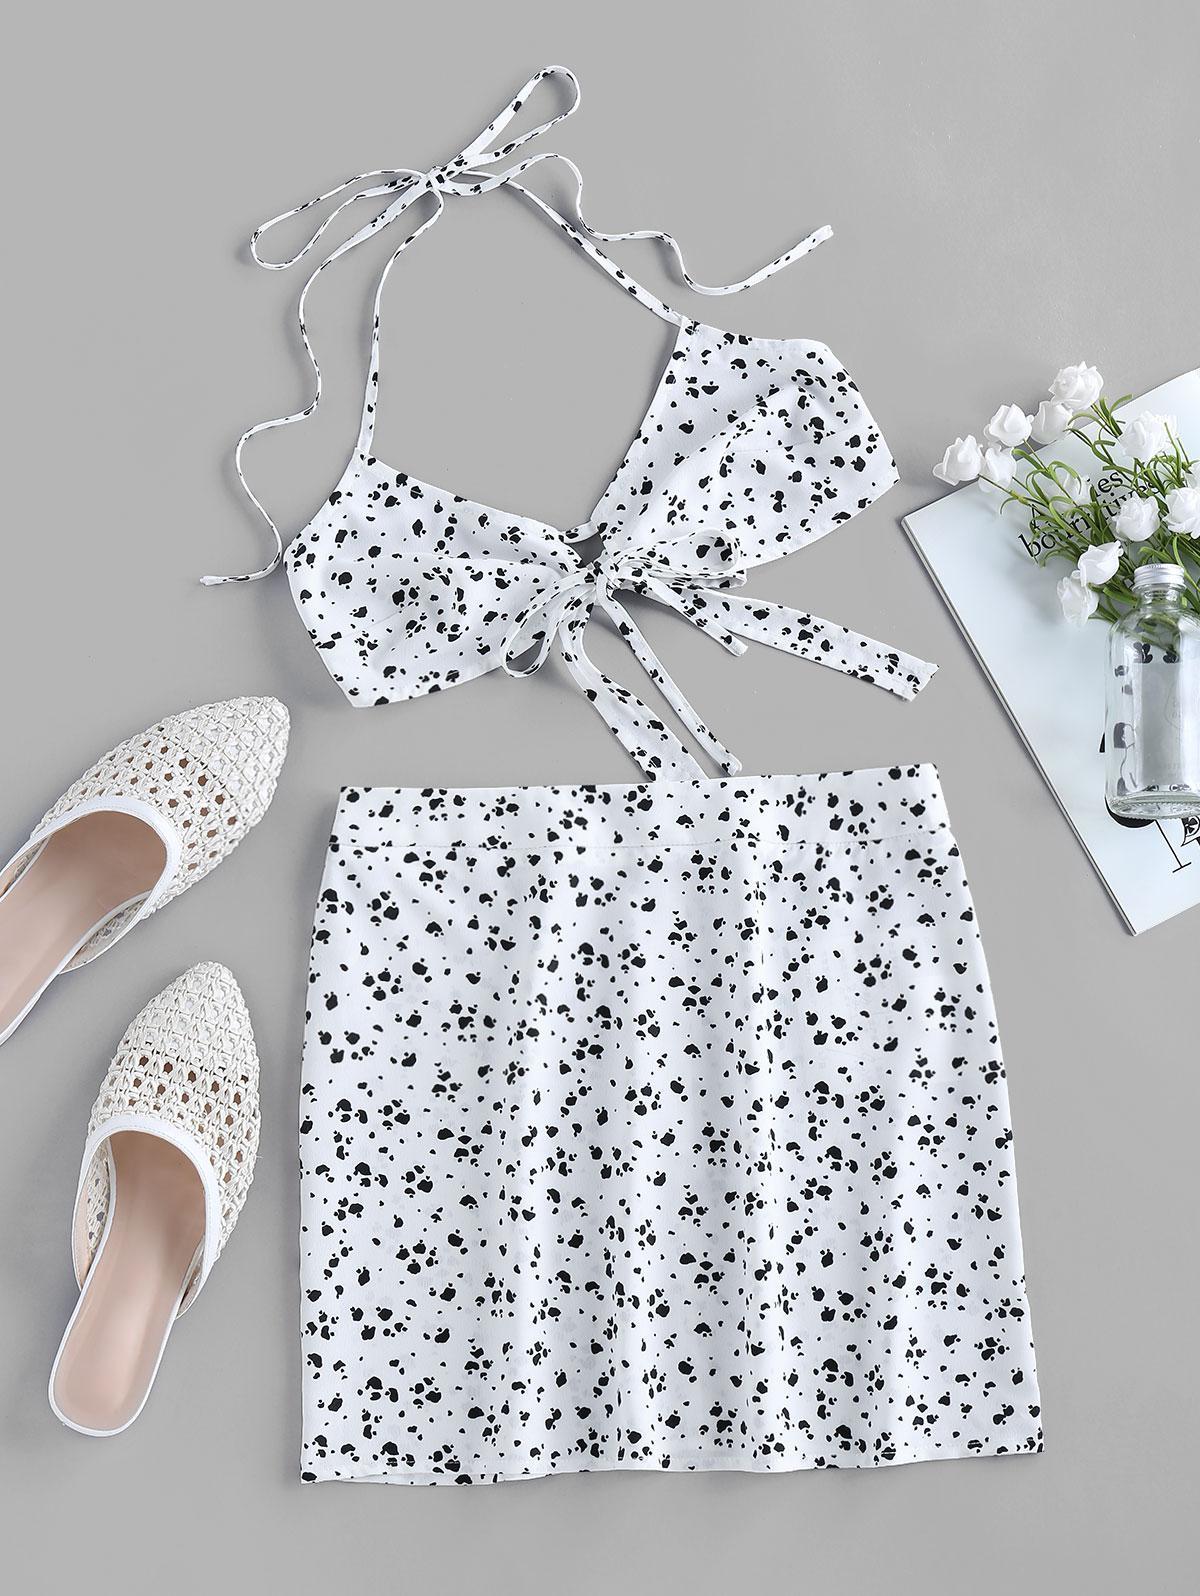 ZAFUL Dalmatian Print Halter Tie Two Piece Dress Set